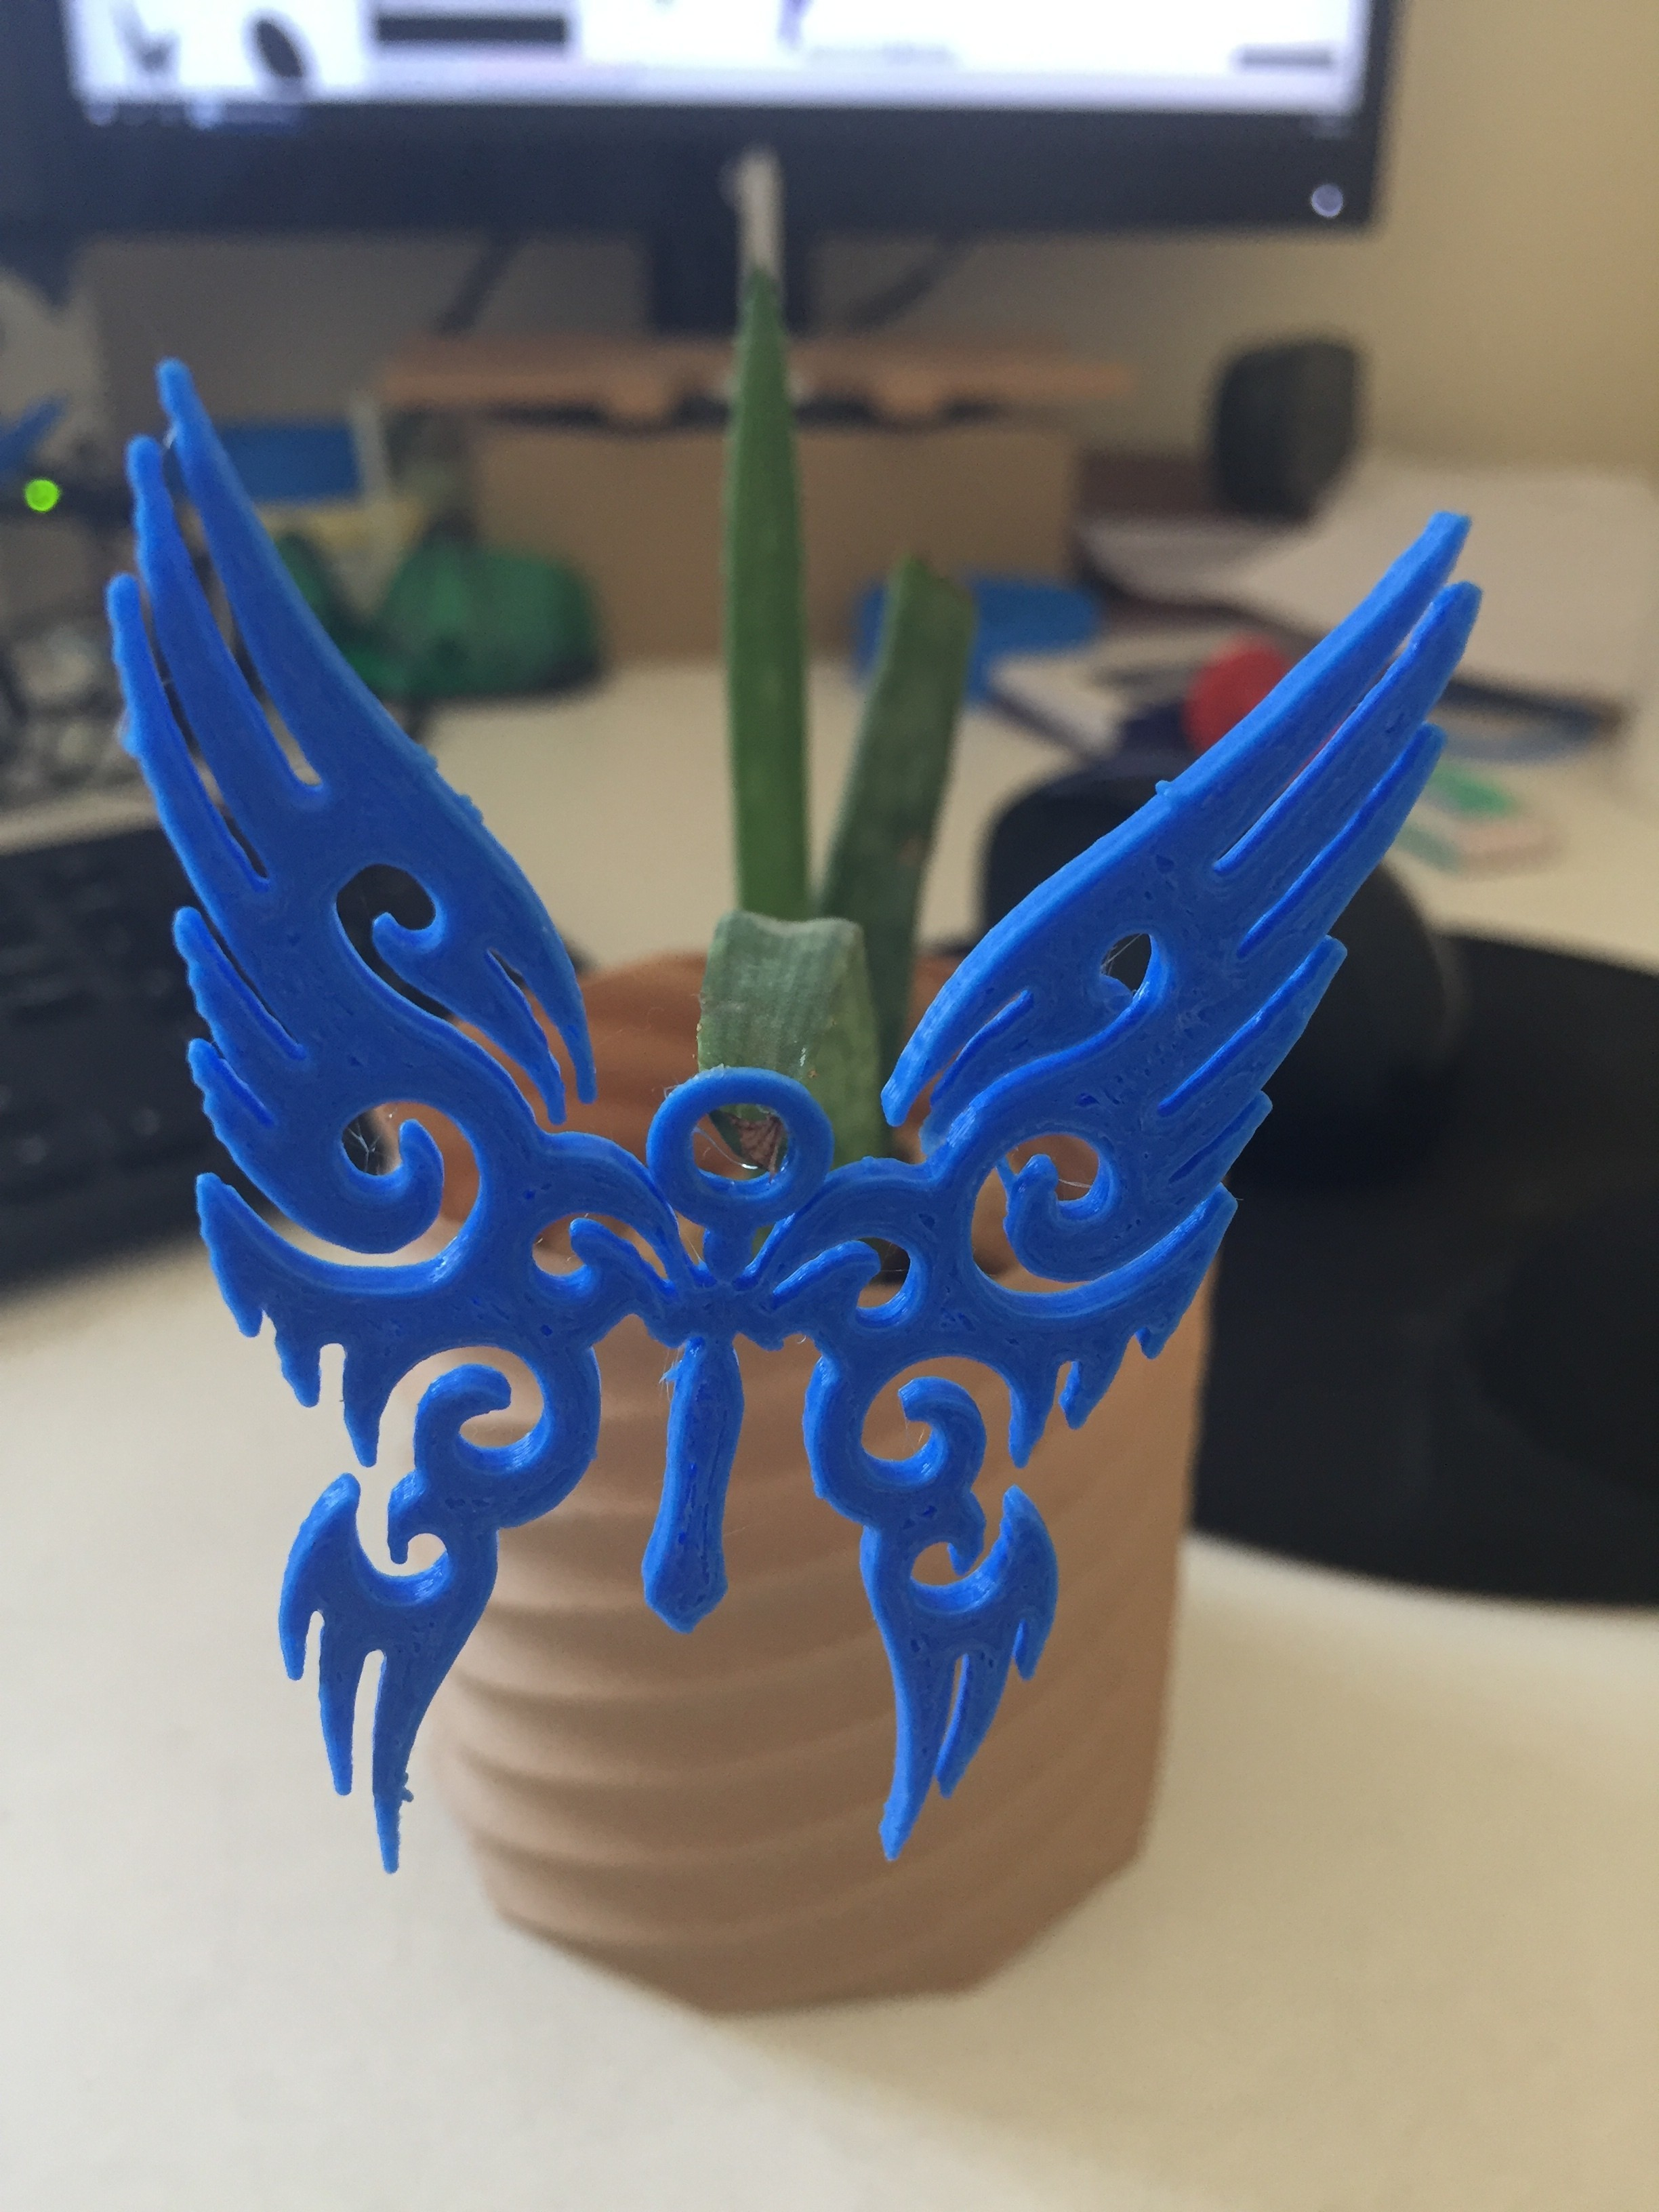 20171207_080307837_iOS.jpg Download STL file Pendant • Template to 3D print, Brahmabeej